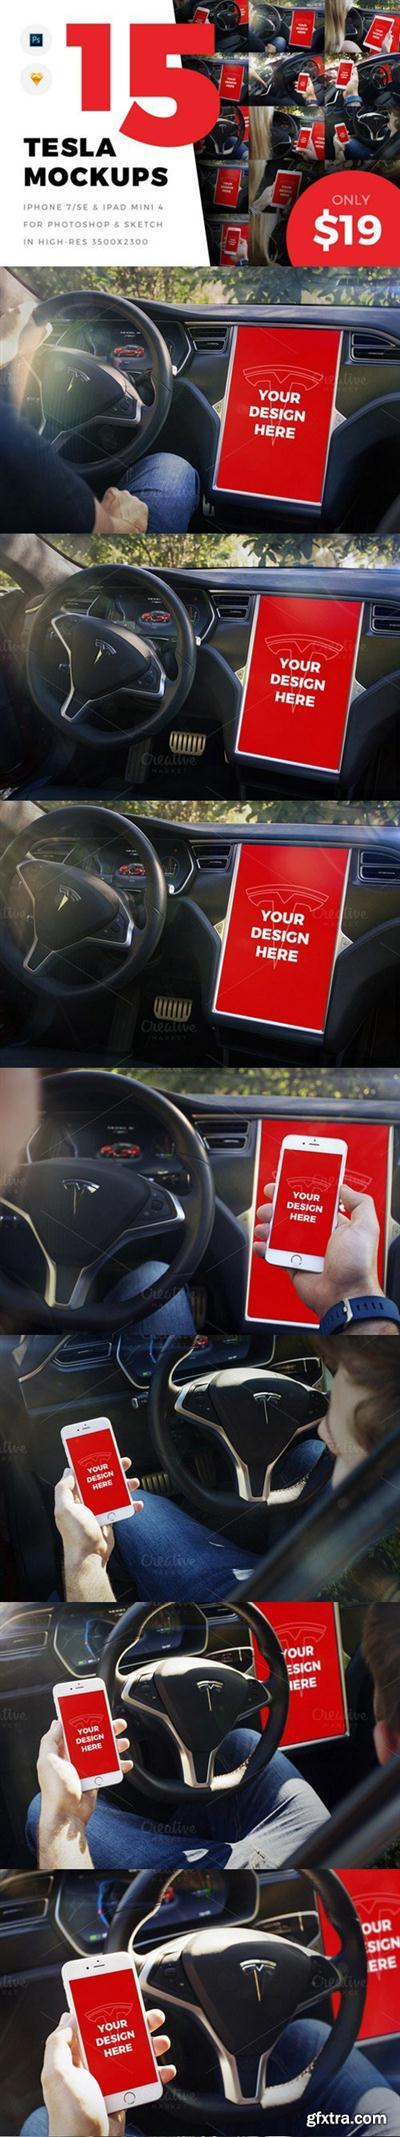 CM - 15 Tesla Mockups (iPhone 7/SE, iPad) 966935